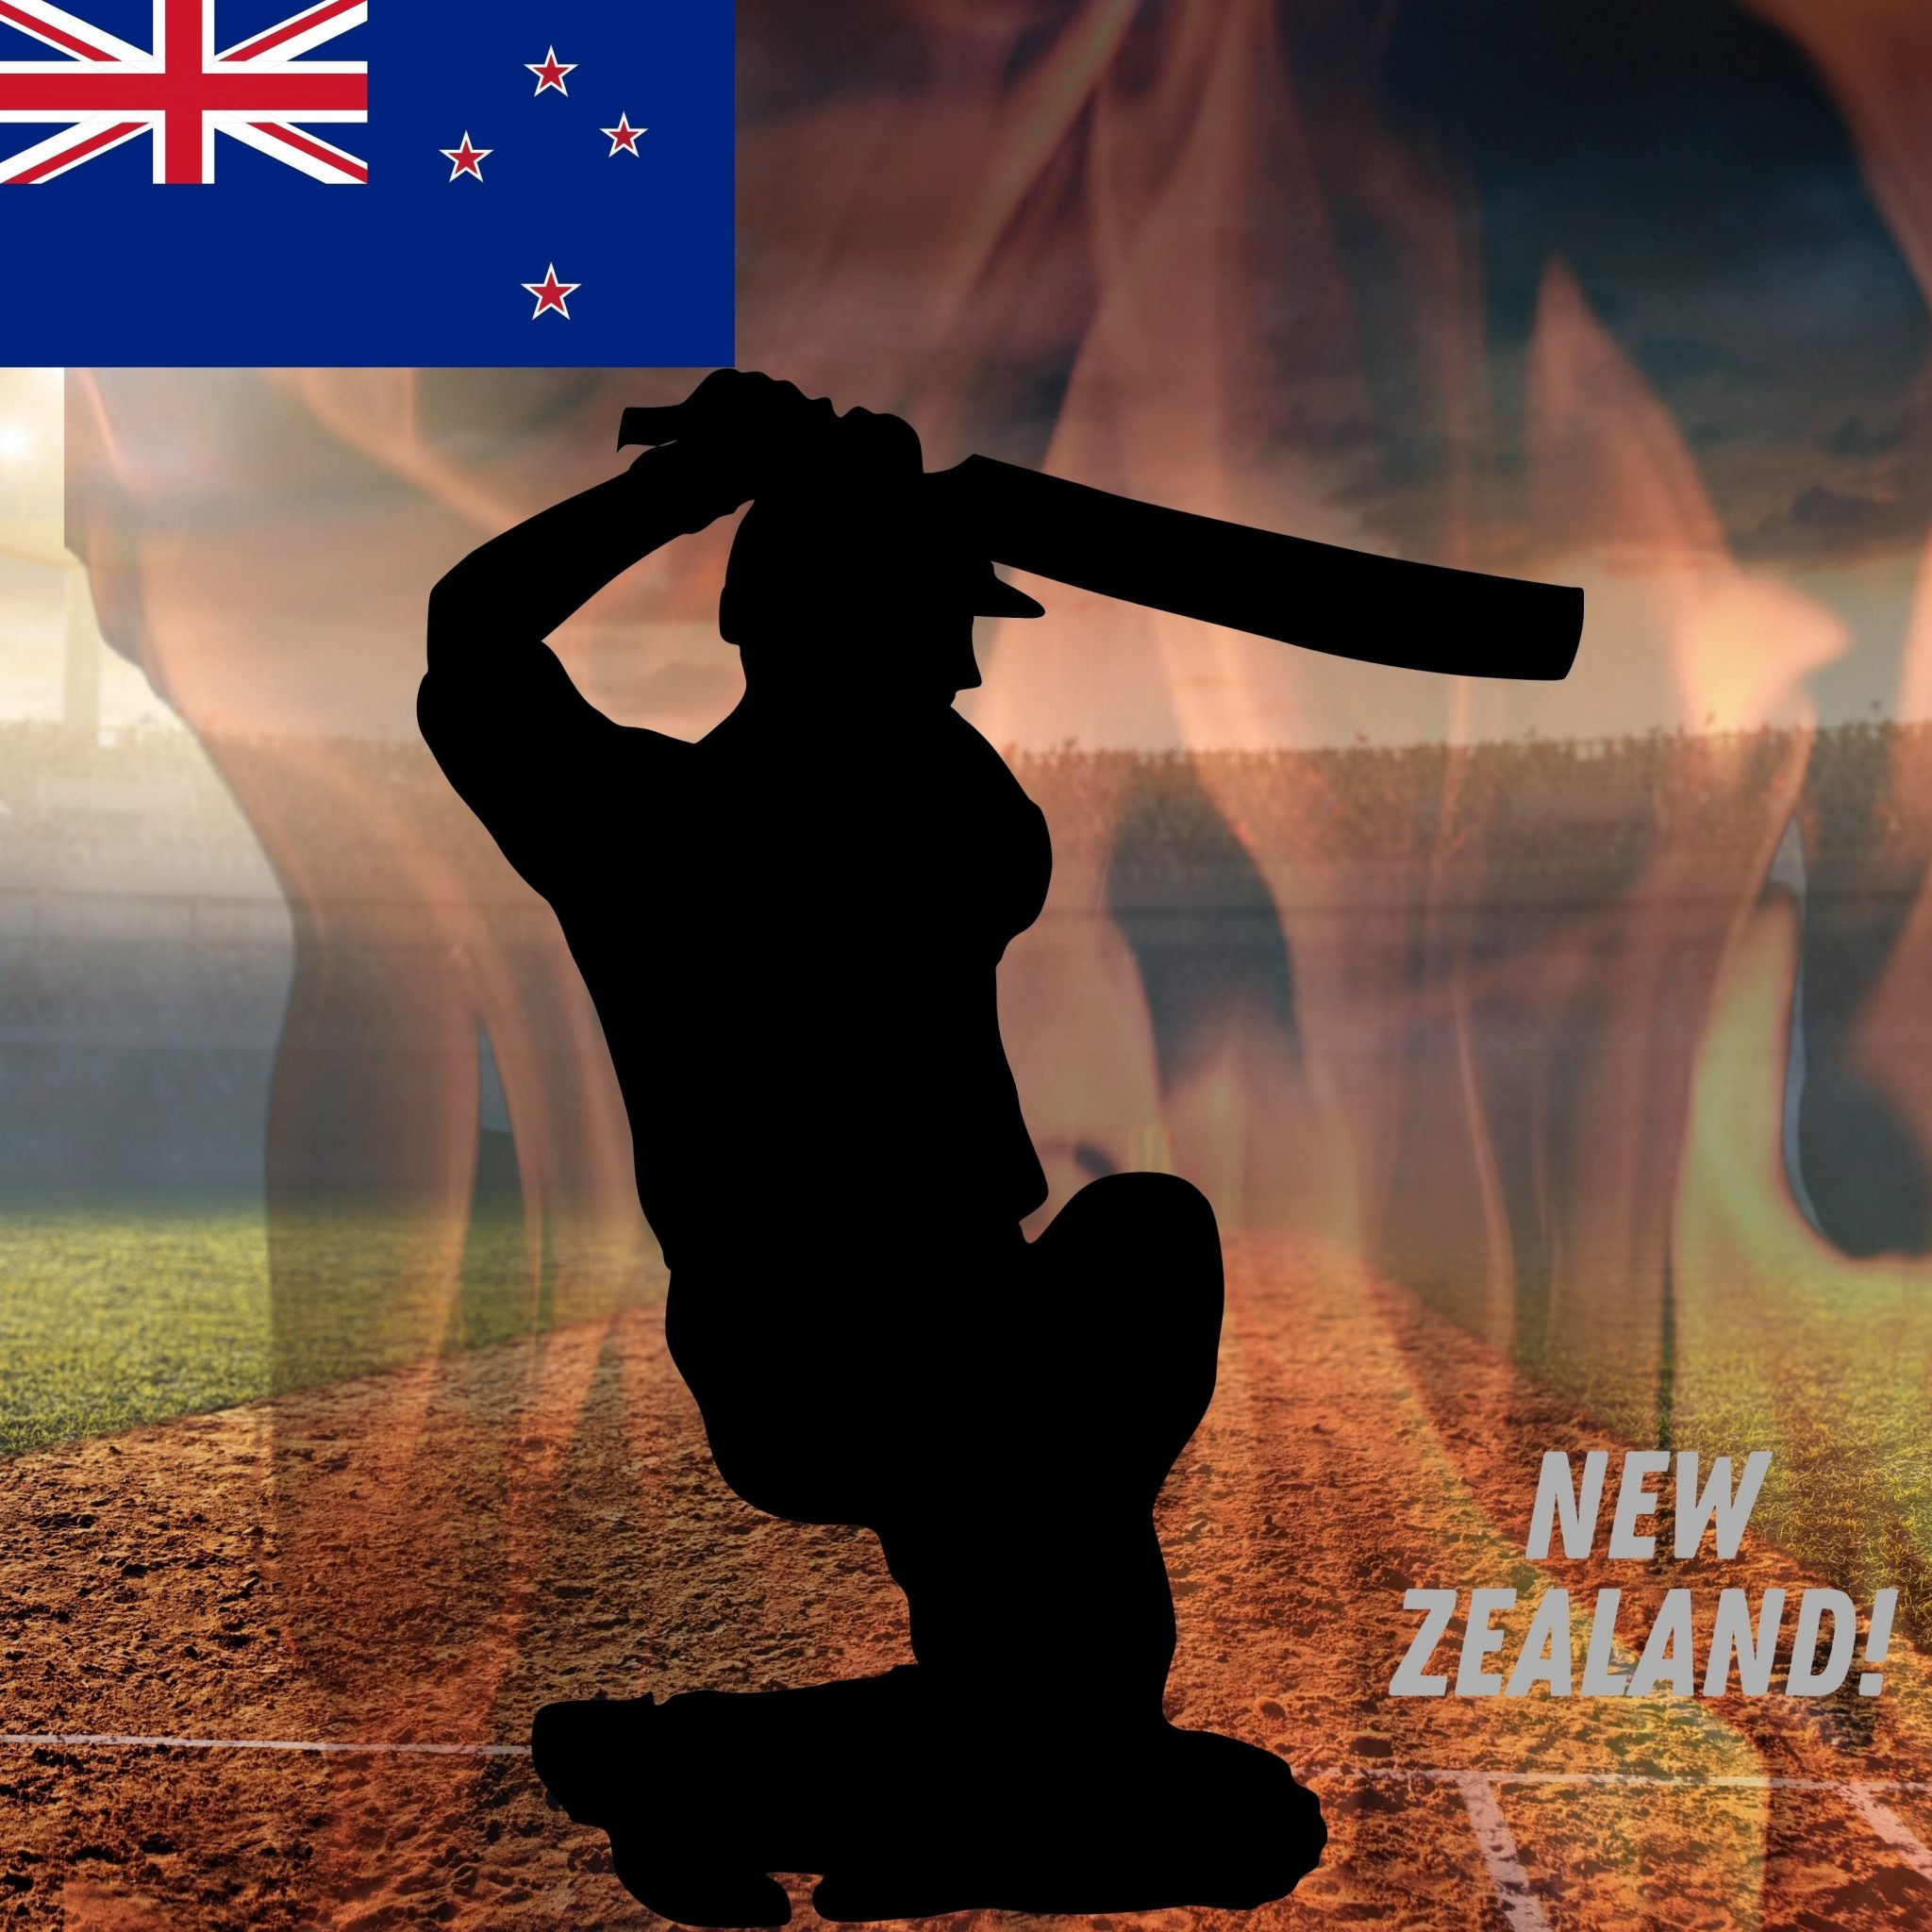 2048x2048 wallpapers iPad retina New Zealand Cricket Stadium iPad Wallpaper 2048x2048 pixels resolution